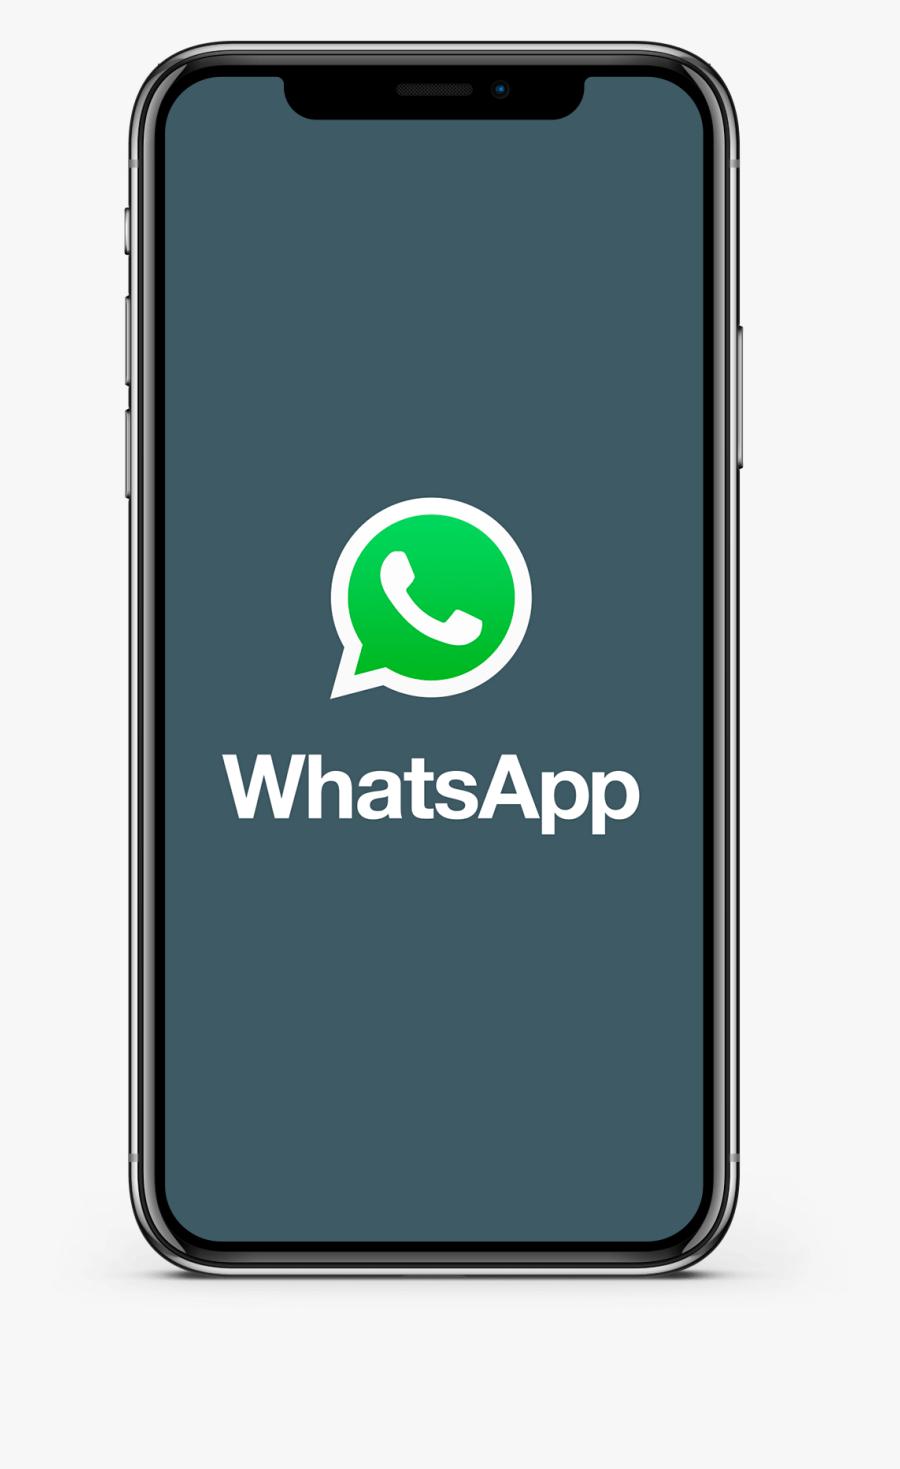 Whatsapp App Iphone - Mobile And Whatsapp Logo, Transparent Clipart